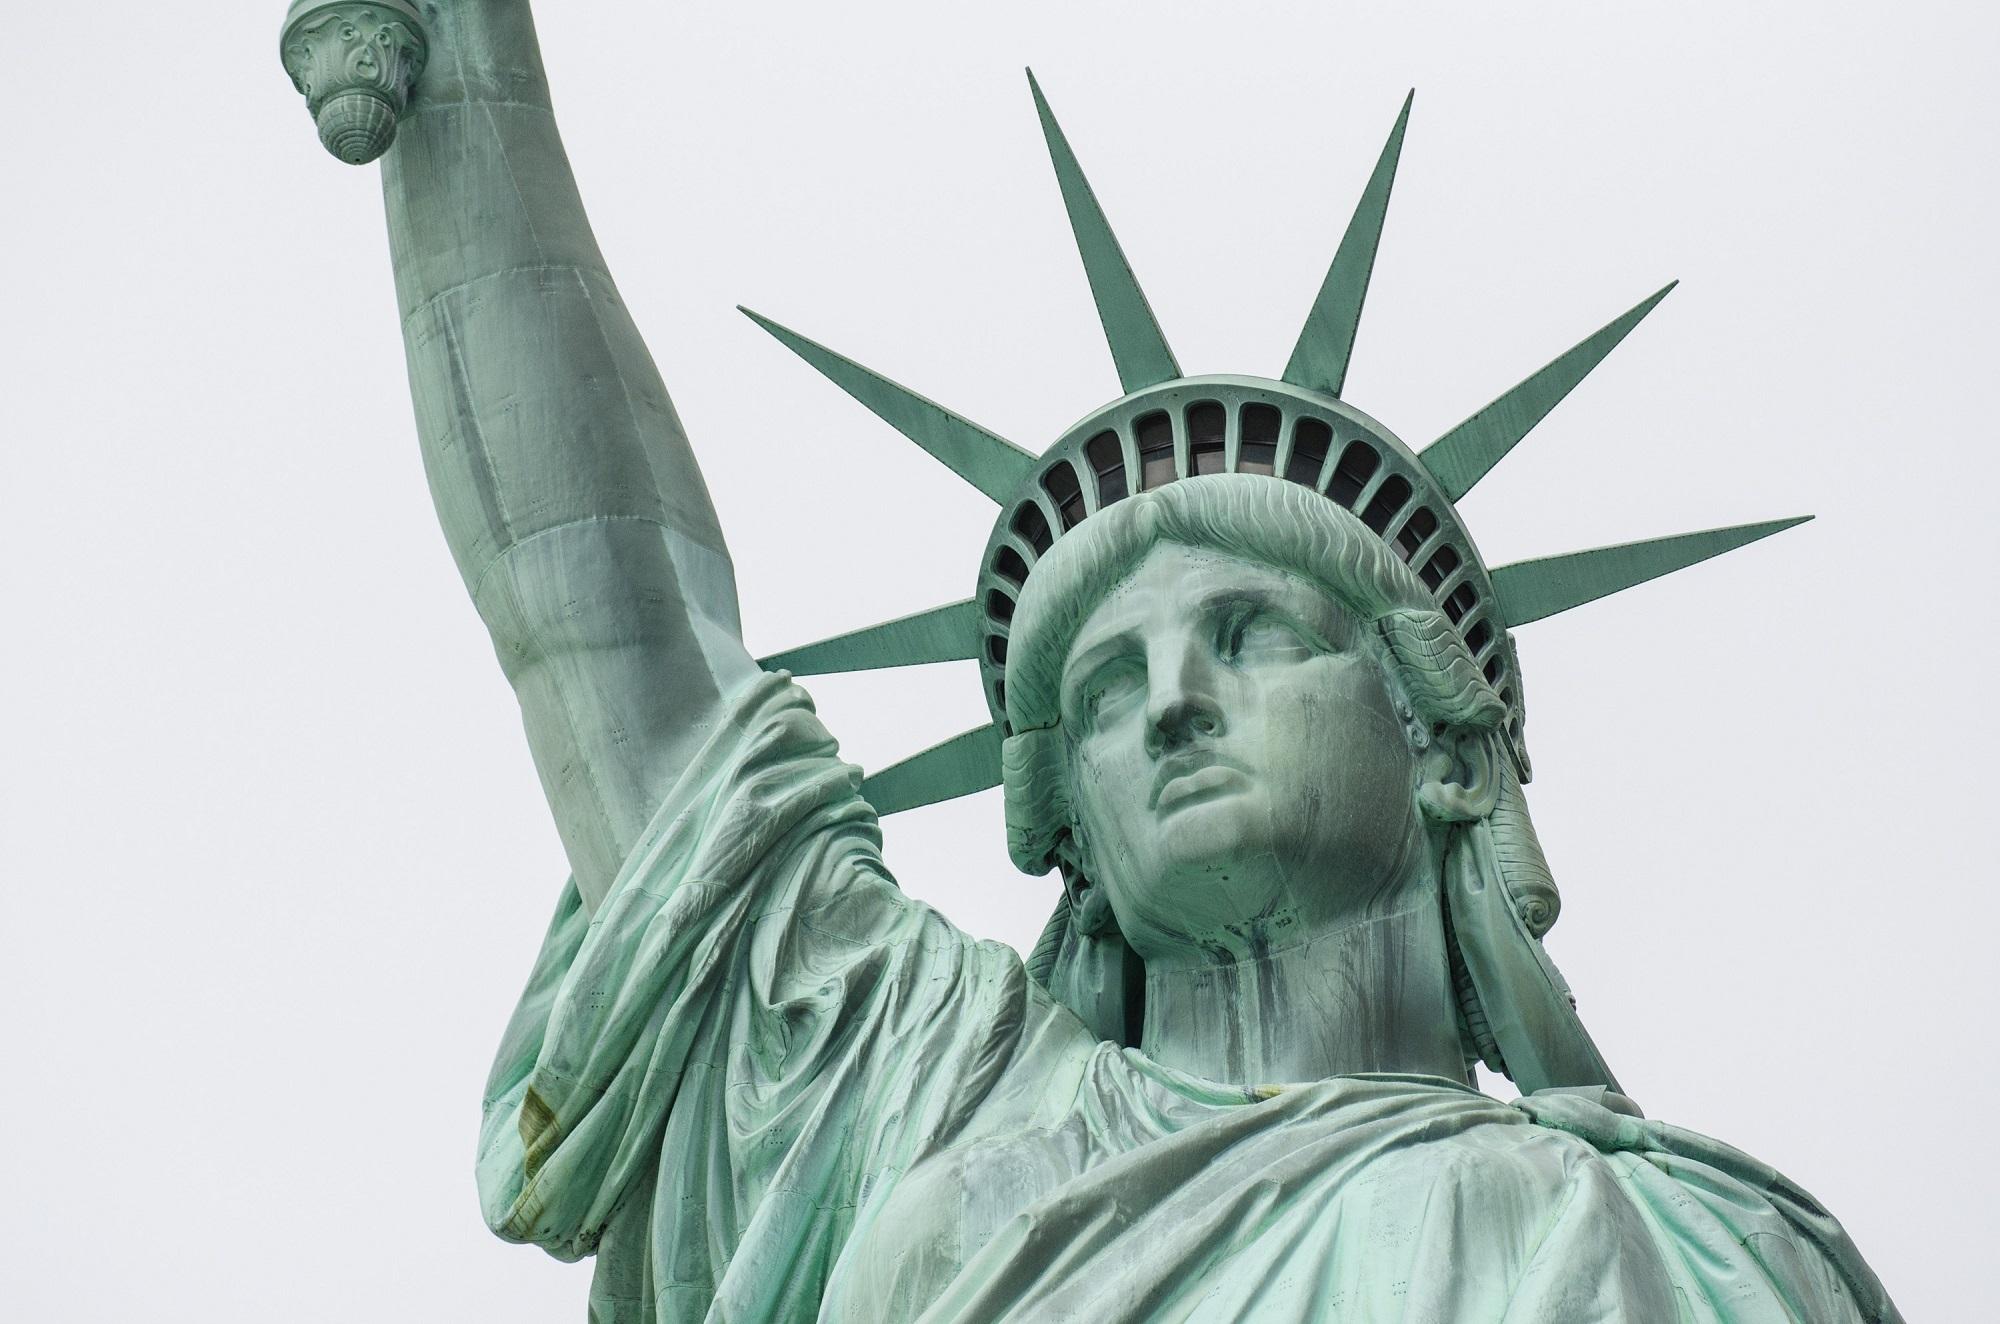 Free images new york manhattan monument green statue of new york manhattan monument statue green statue of liberty symbol nyc america landmark freedom attraction lady biocorpaavc